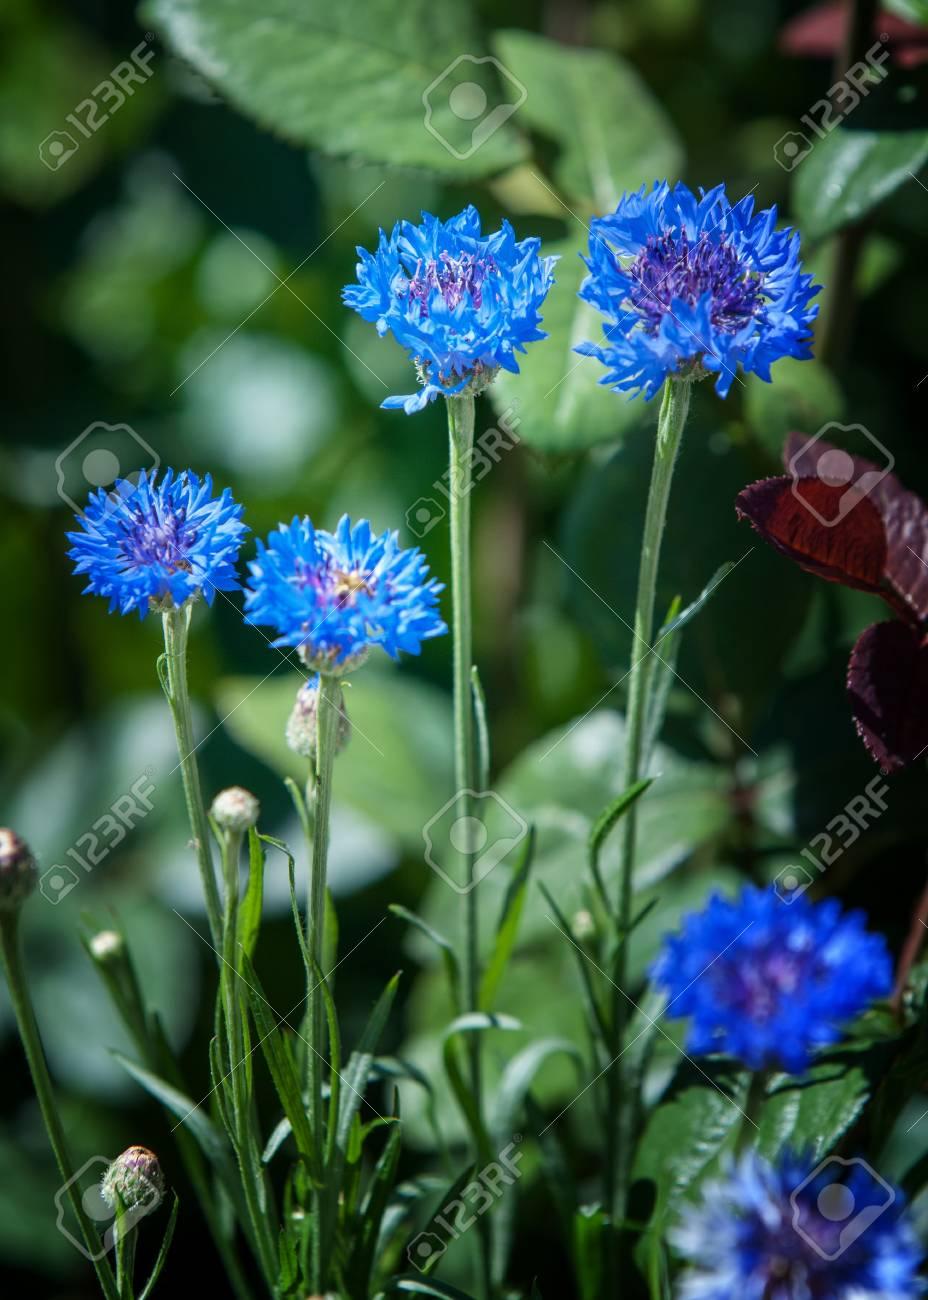 Flowers cornflowers a slender eurasian plant related to the stock flowers cornflowers a slender eurasian plant related to the knapweed with flowers that are izmirmasajfo